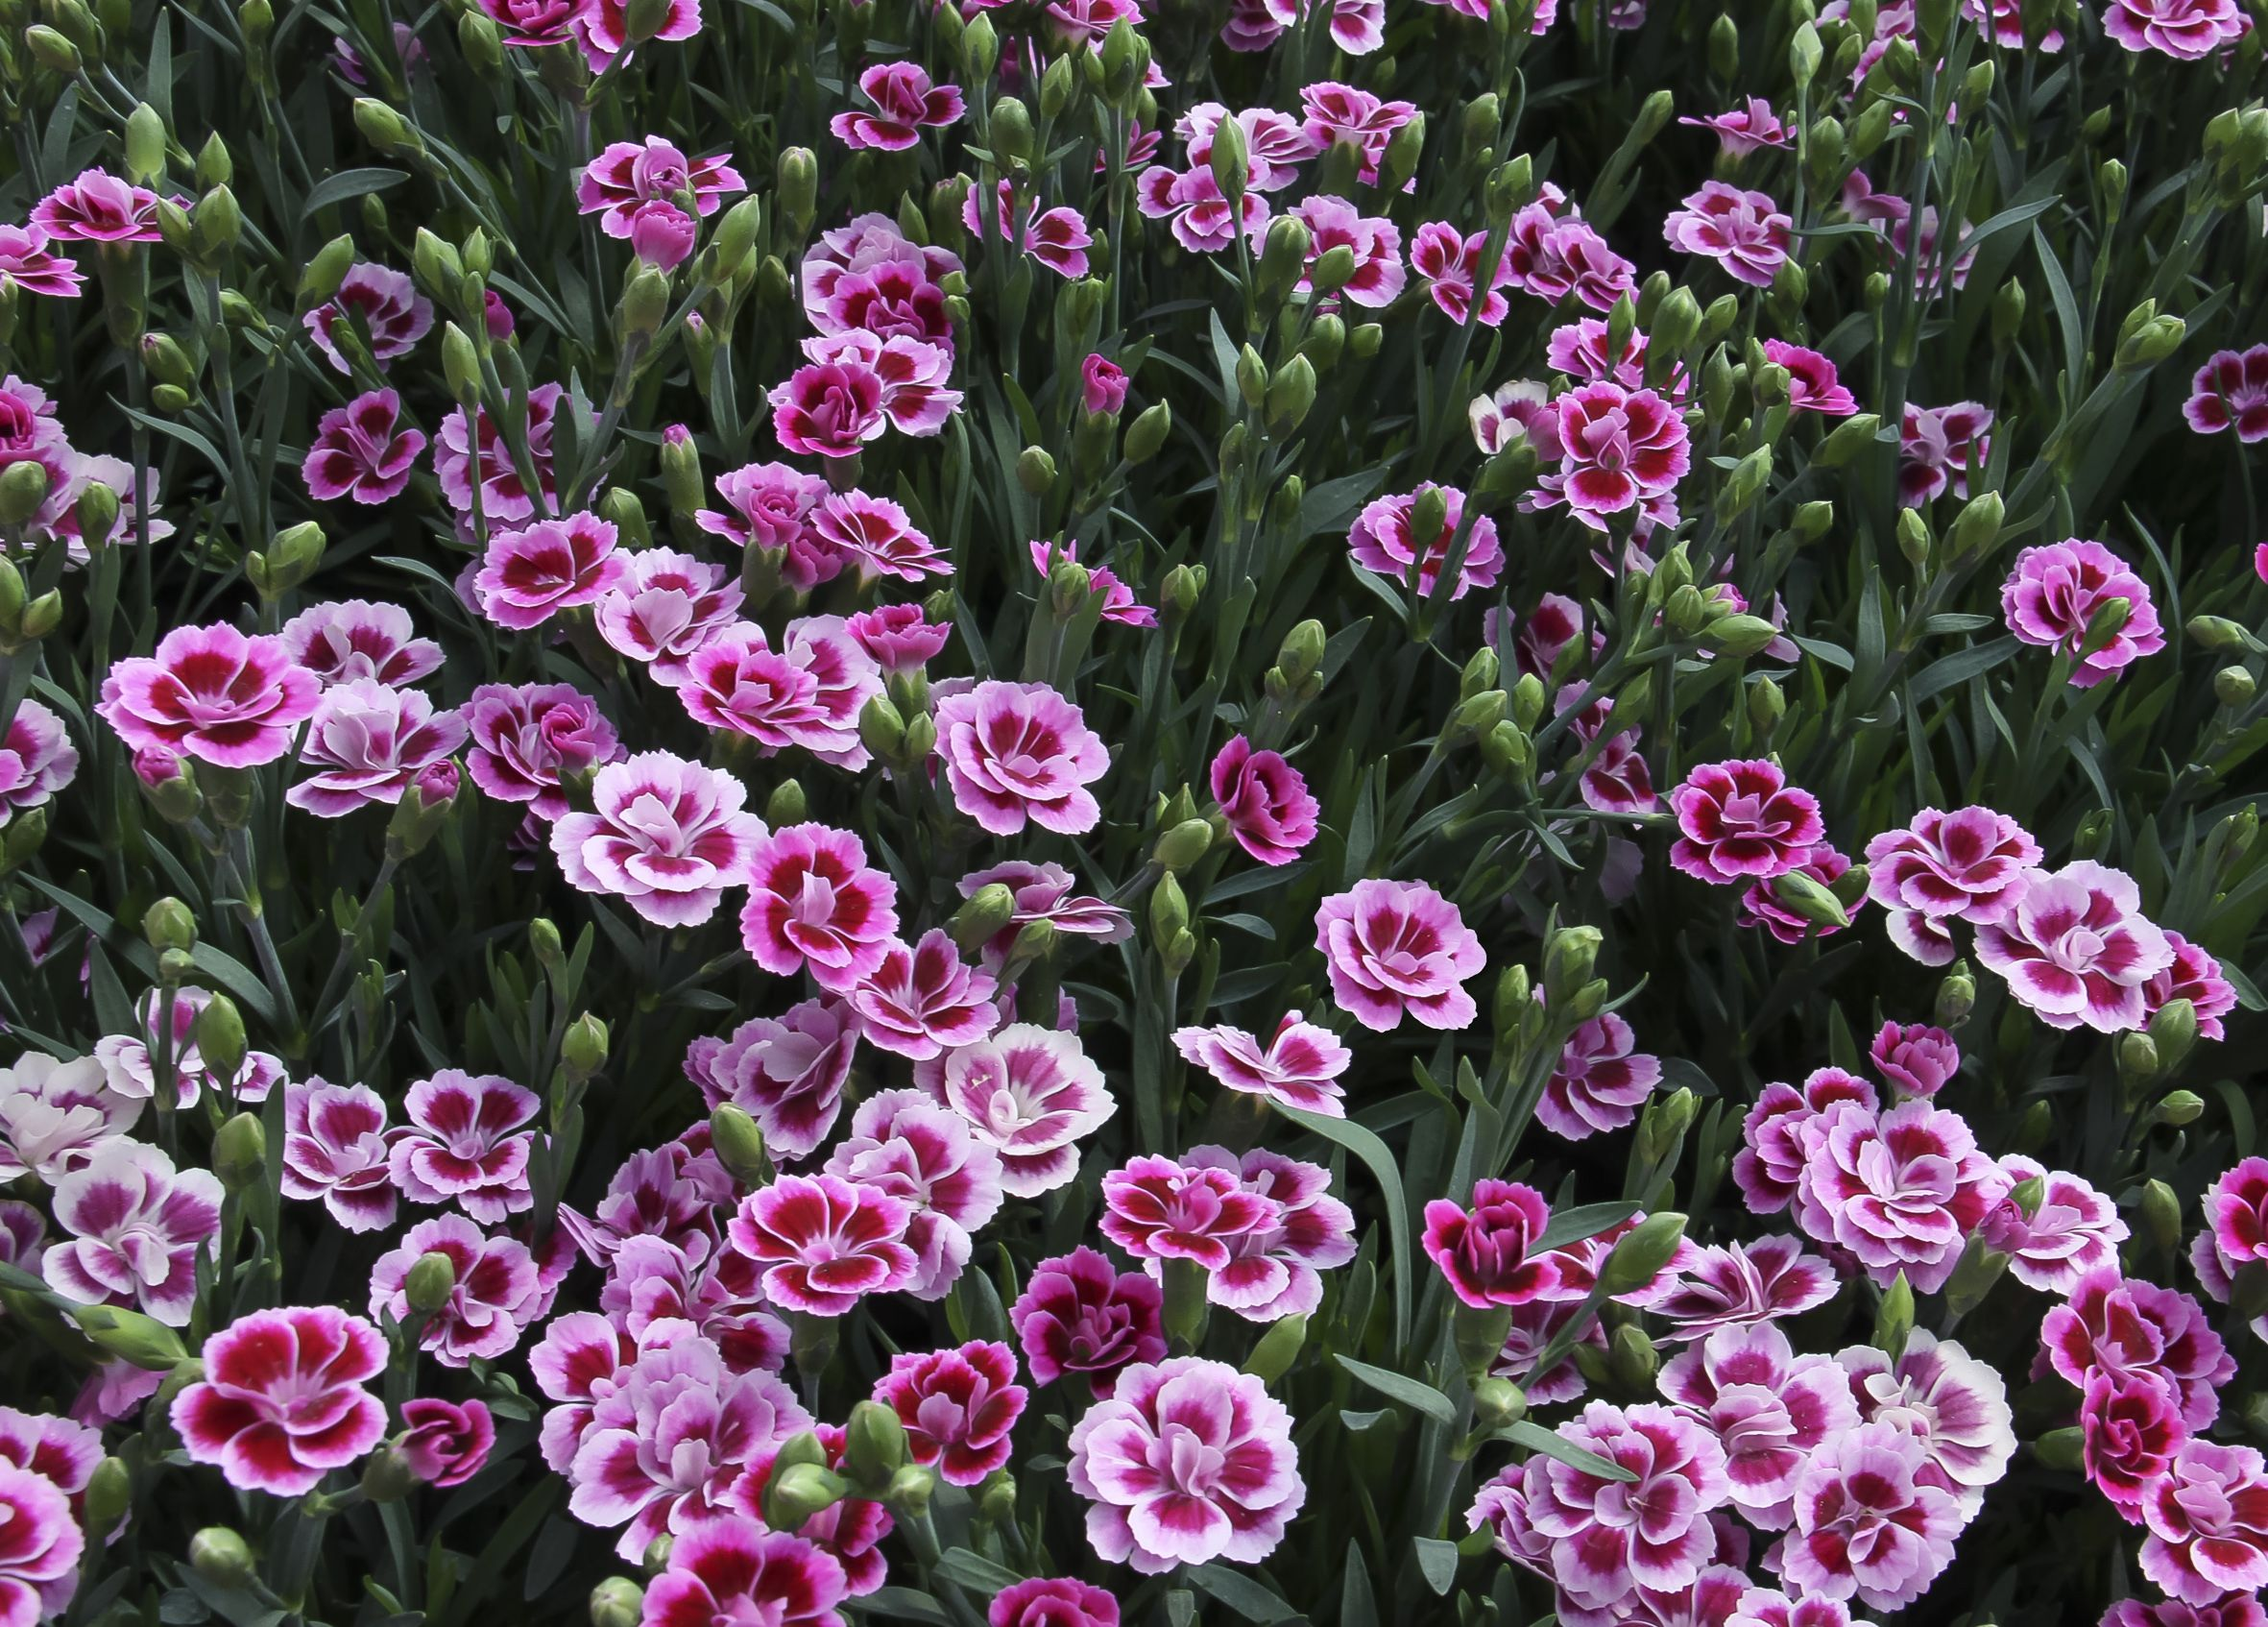 Dianthus Caryophyllus Pink Kisses Blc3bctenmeer Photo Selecta Klemm Jpg 2362 1694